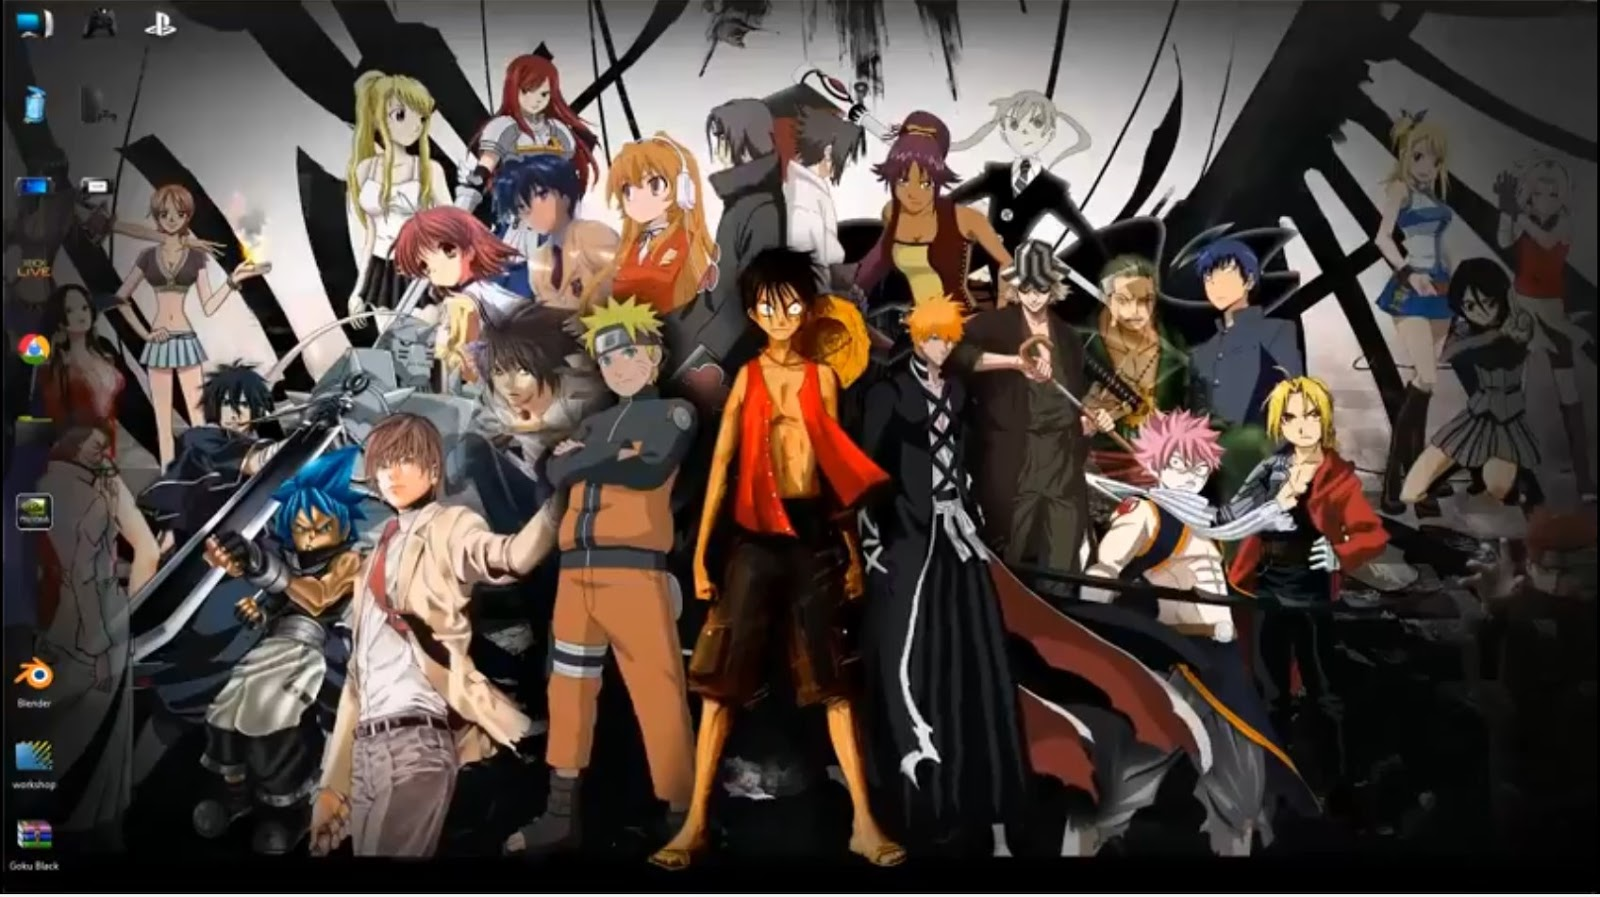 Anime 4k Wallpaper: All Star Anime Heroes 4k Live Wallpaper Free Download